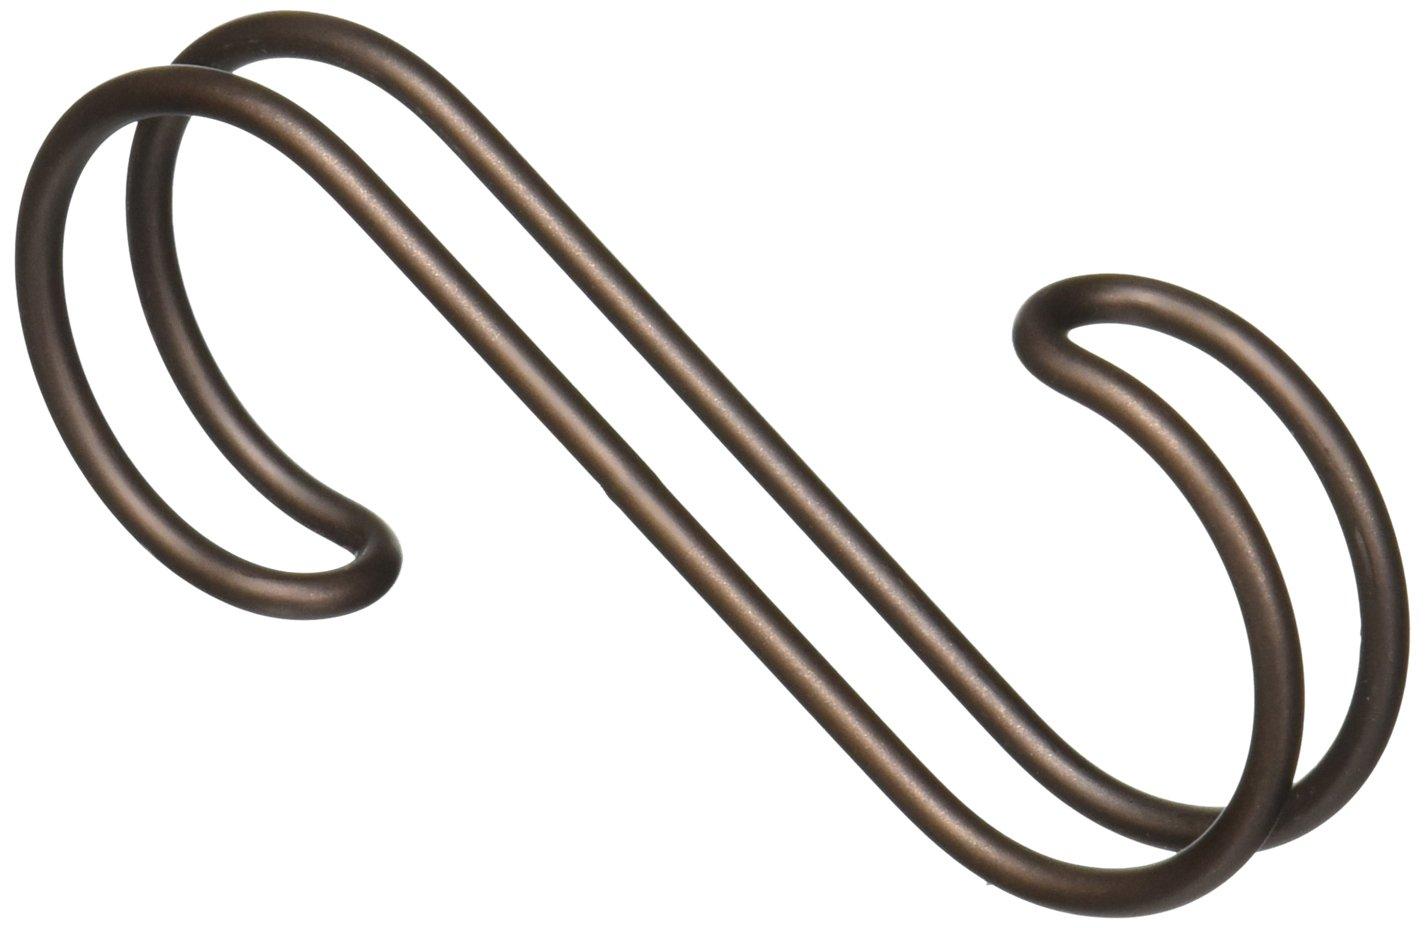 Handbags Closet Accessory Organizer for Scarves InterDesign Classico Over the Rod Pashminas Bronze Loop